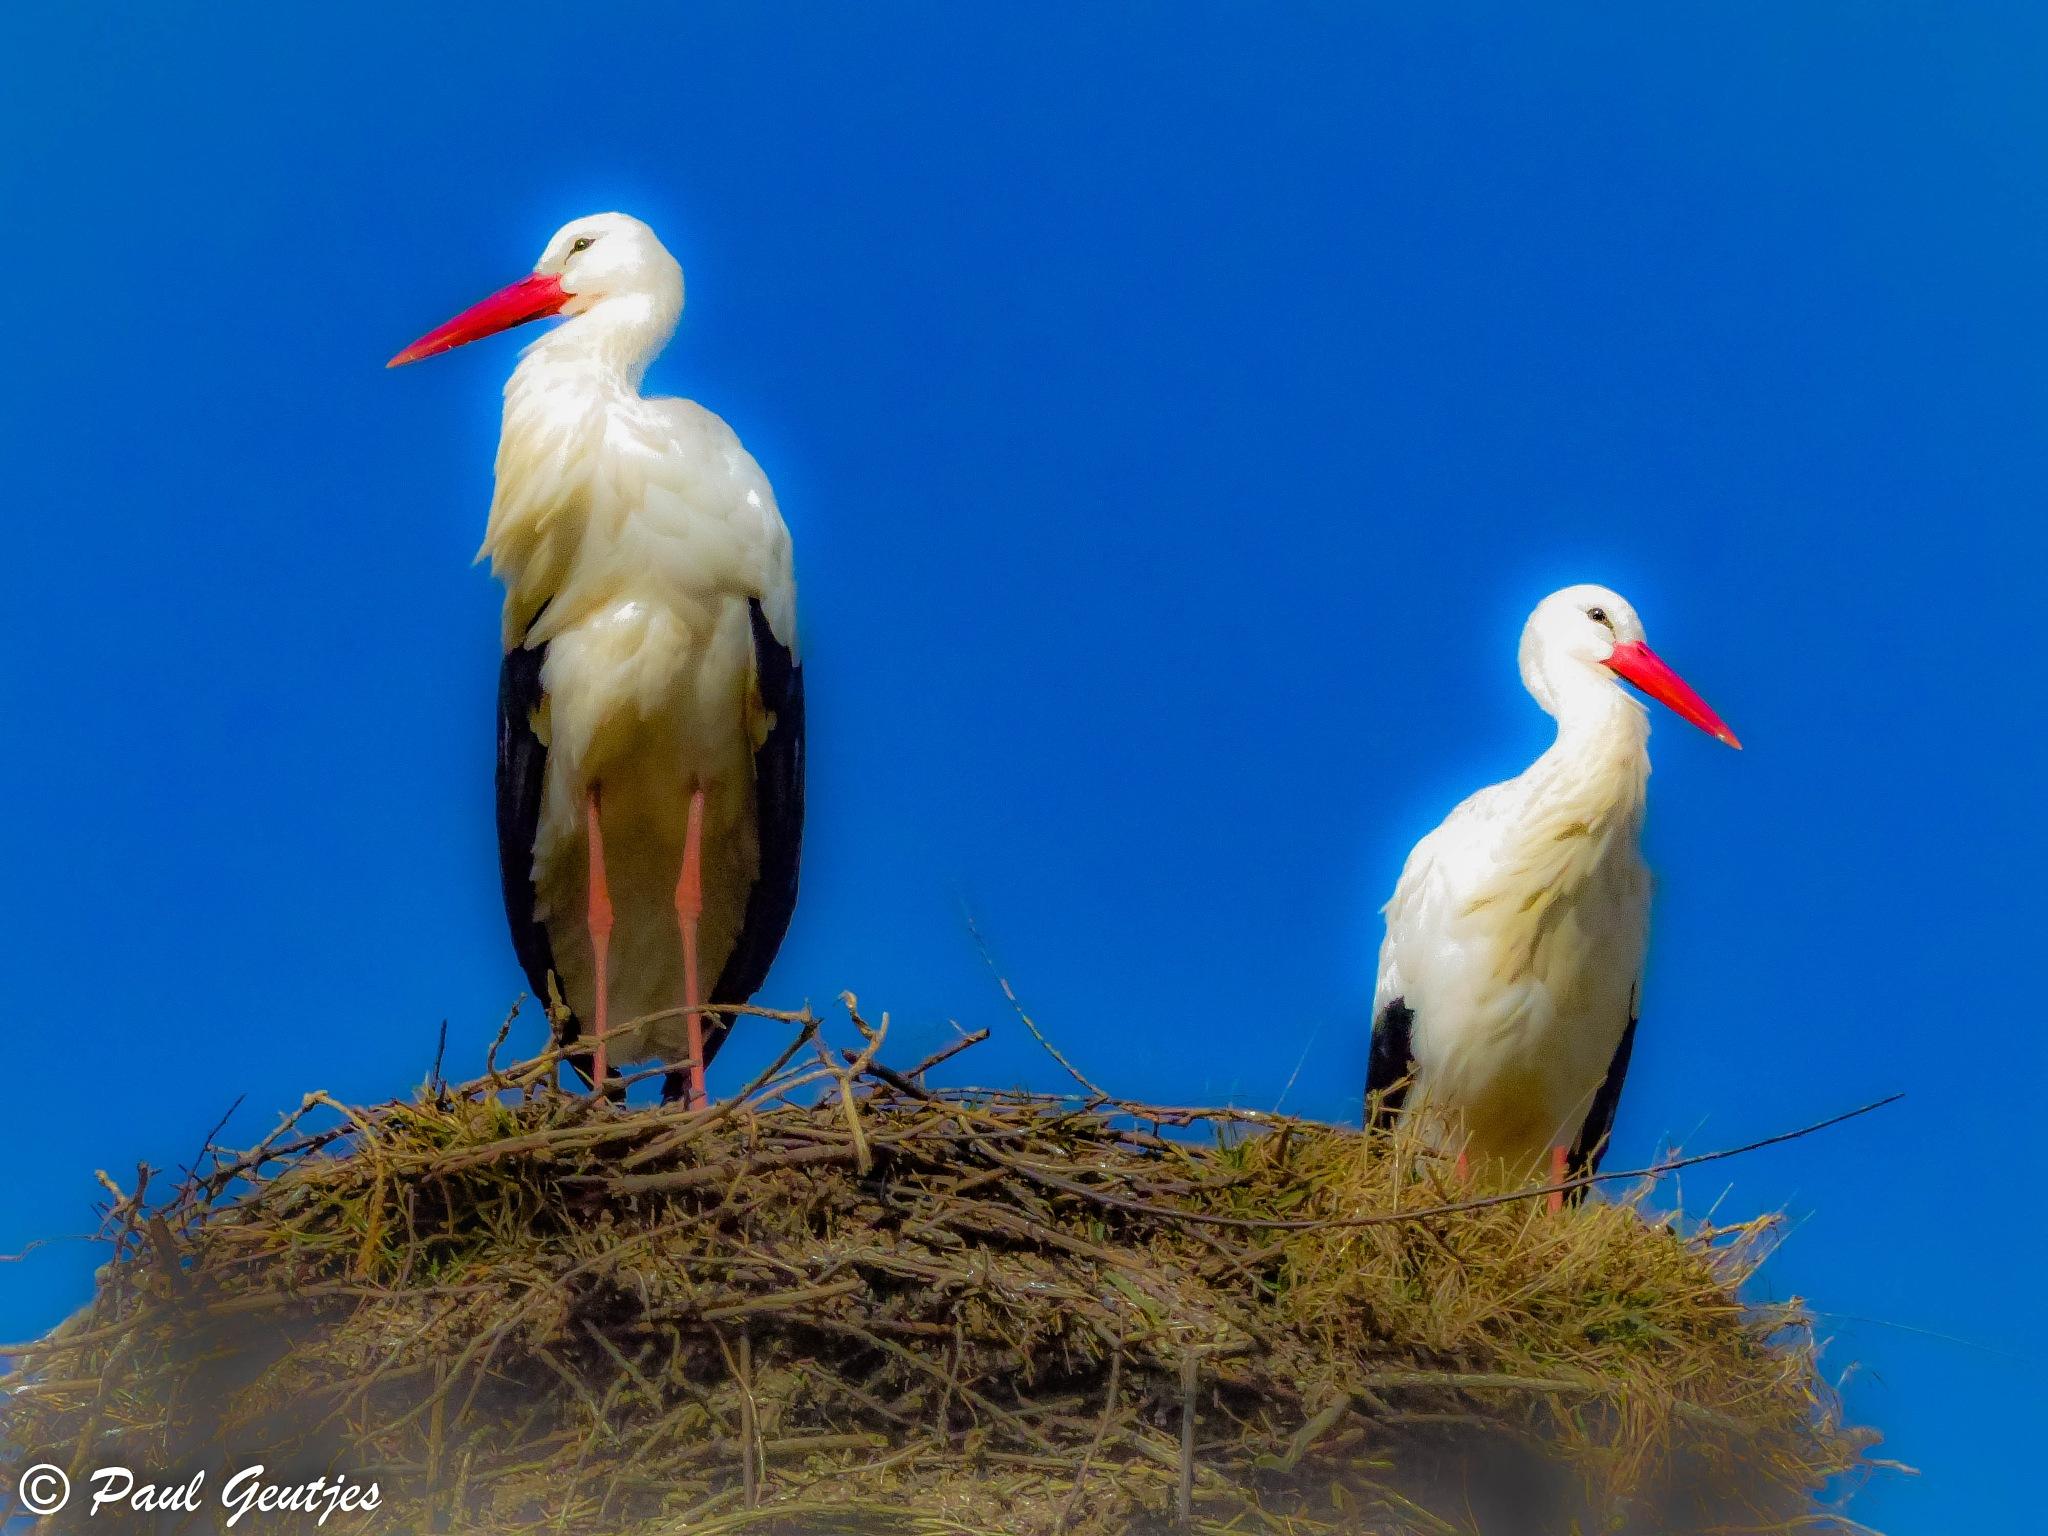 Storks 2 by Paul Geutjes